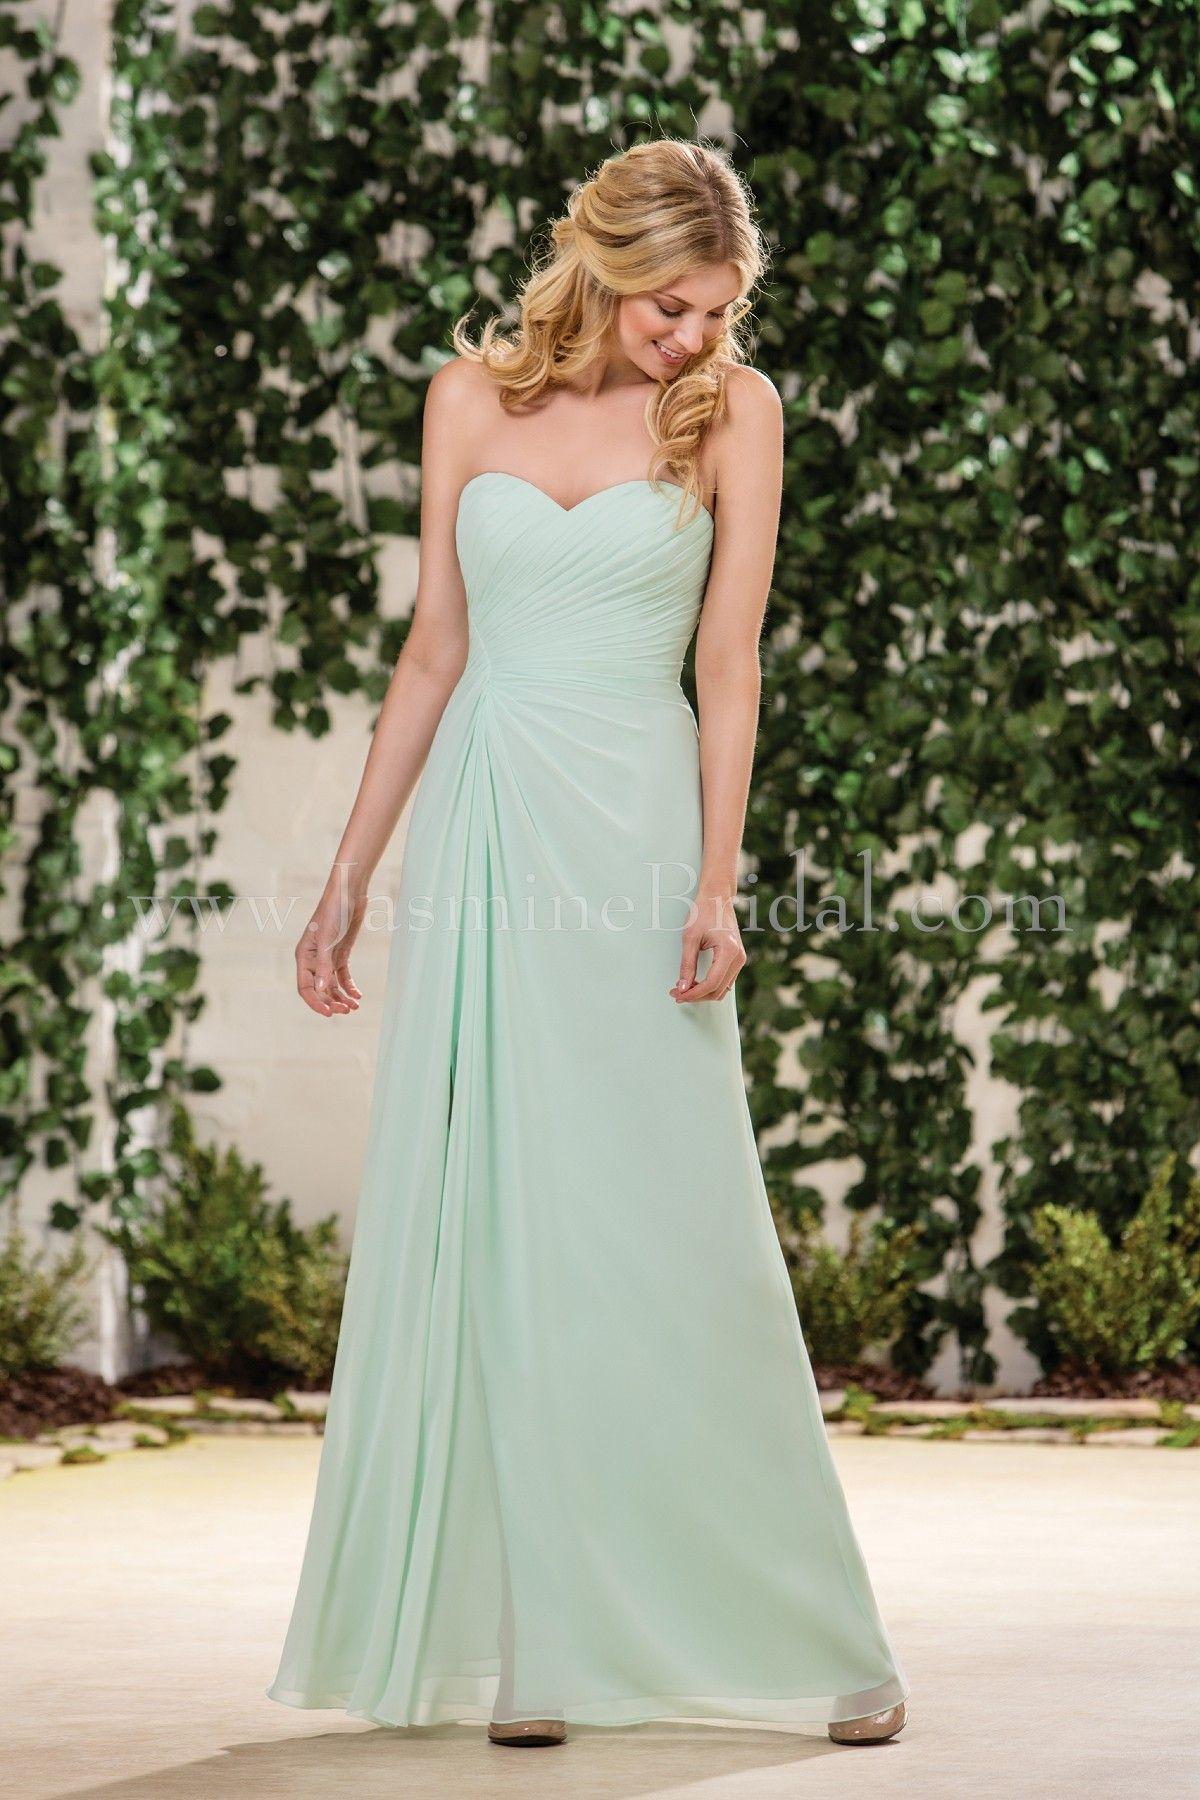 Jasmine bridal bridesmaid dress b2 style b183053 in seamist fall jasmine bridal bridesmaid dress b2 style b183053 in seamist ombrellifo Images